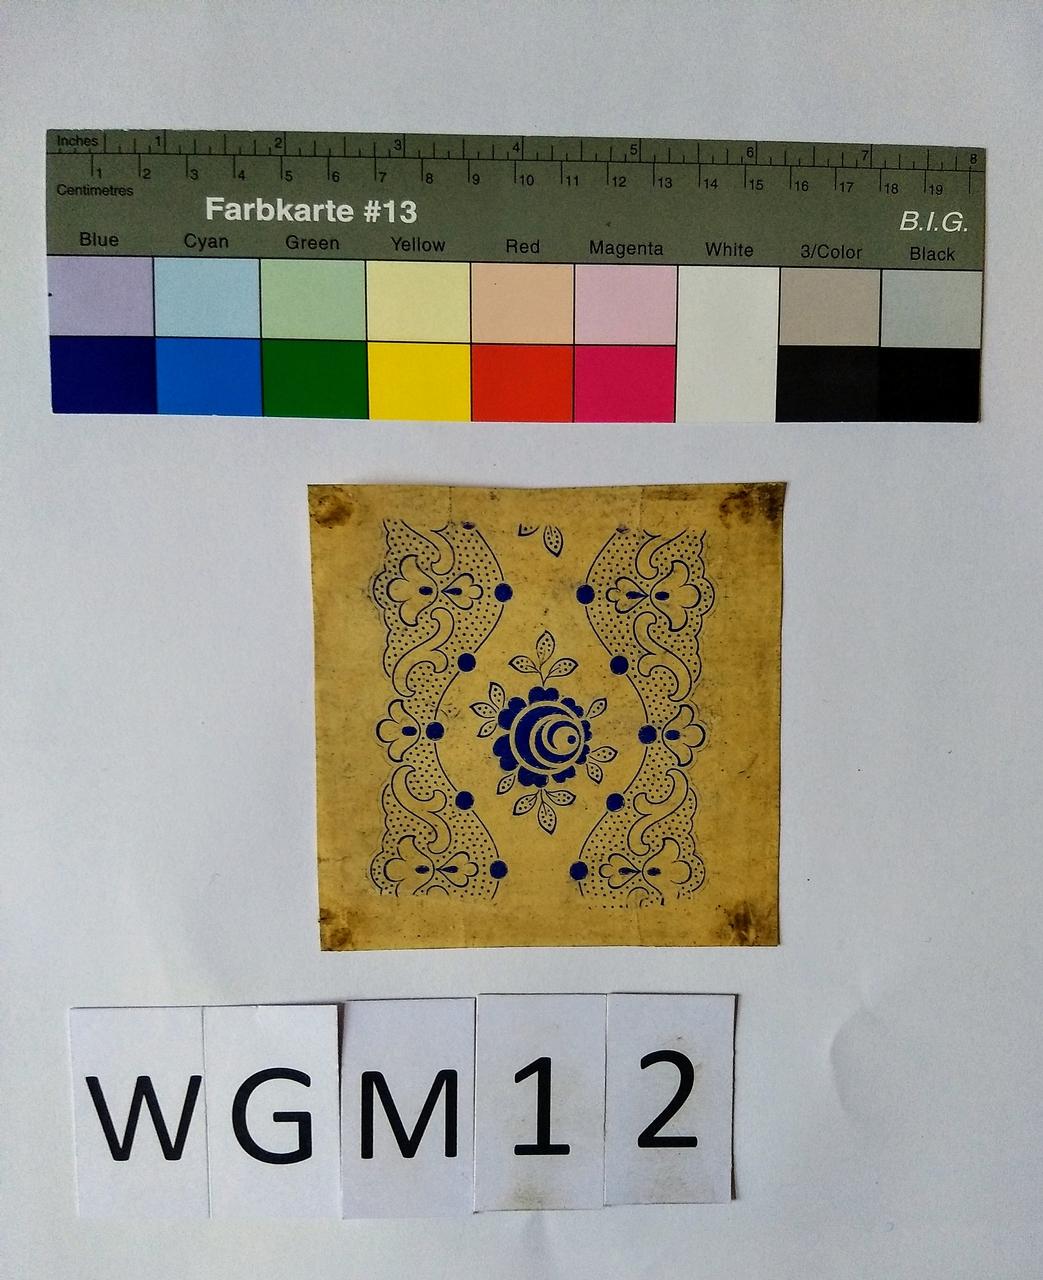 Musterabdruck florales Muster